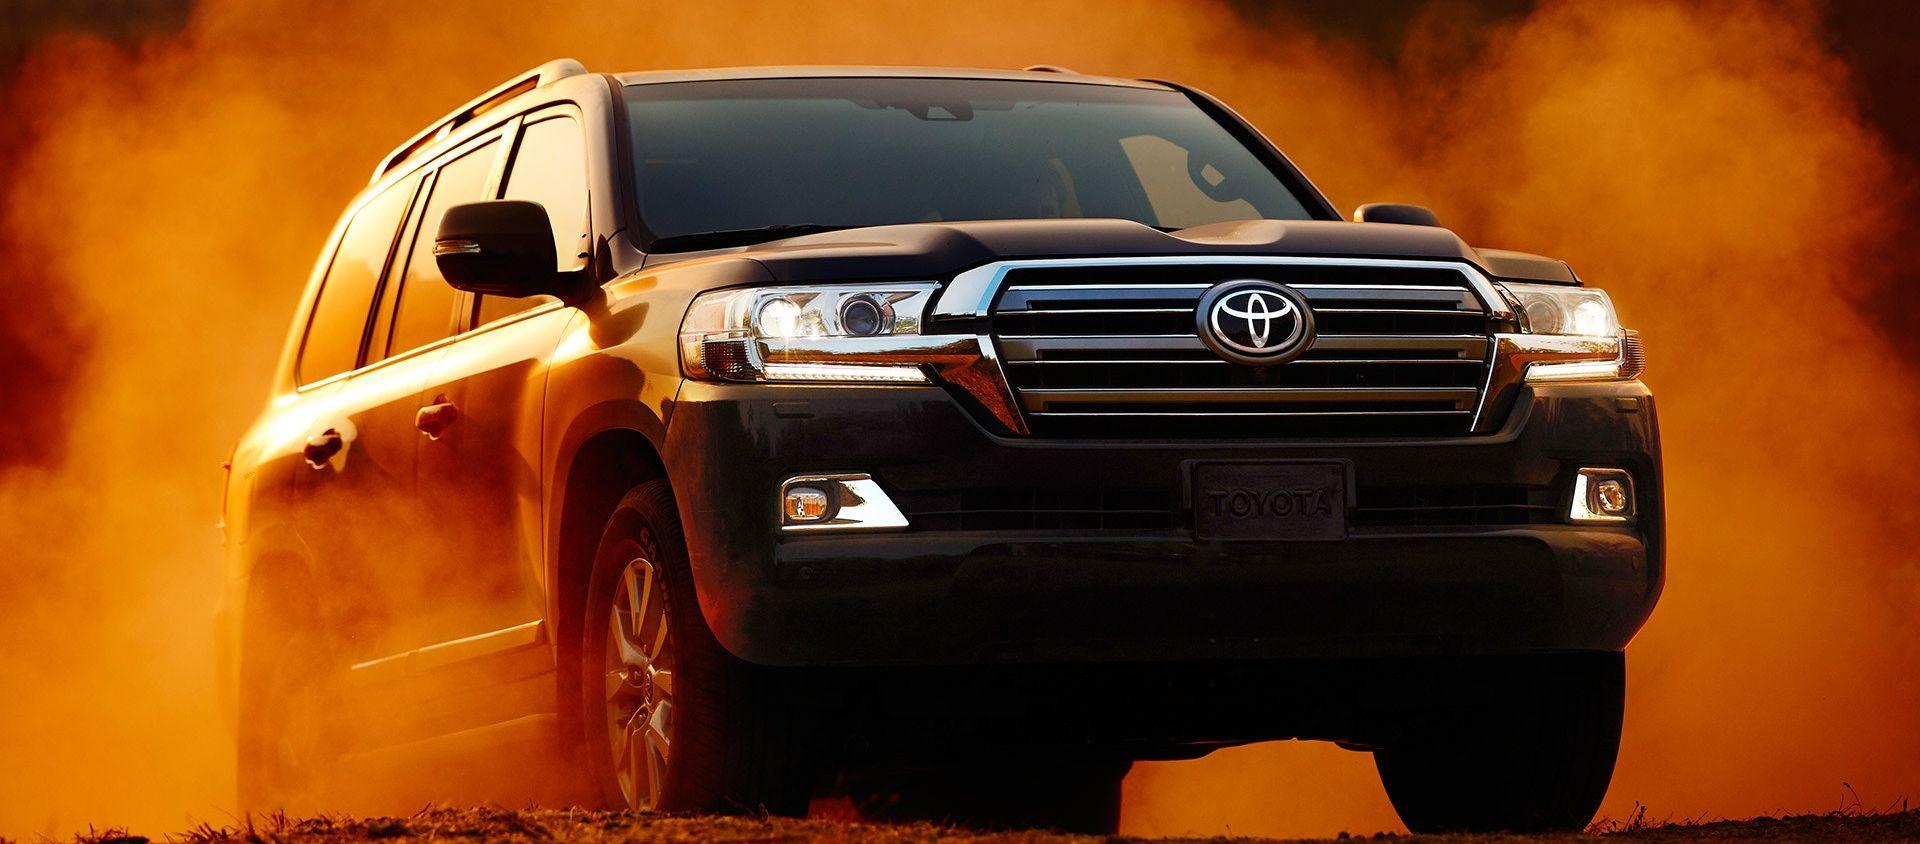 2019 Toyota Land Cruiser for Sale near Riverside, IA